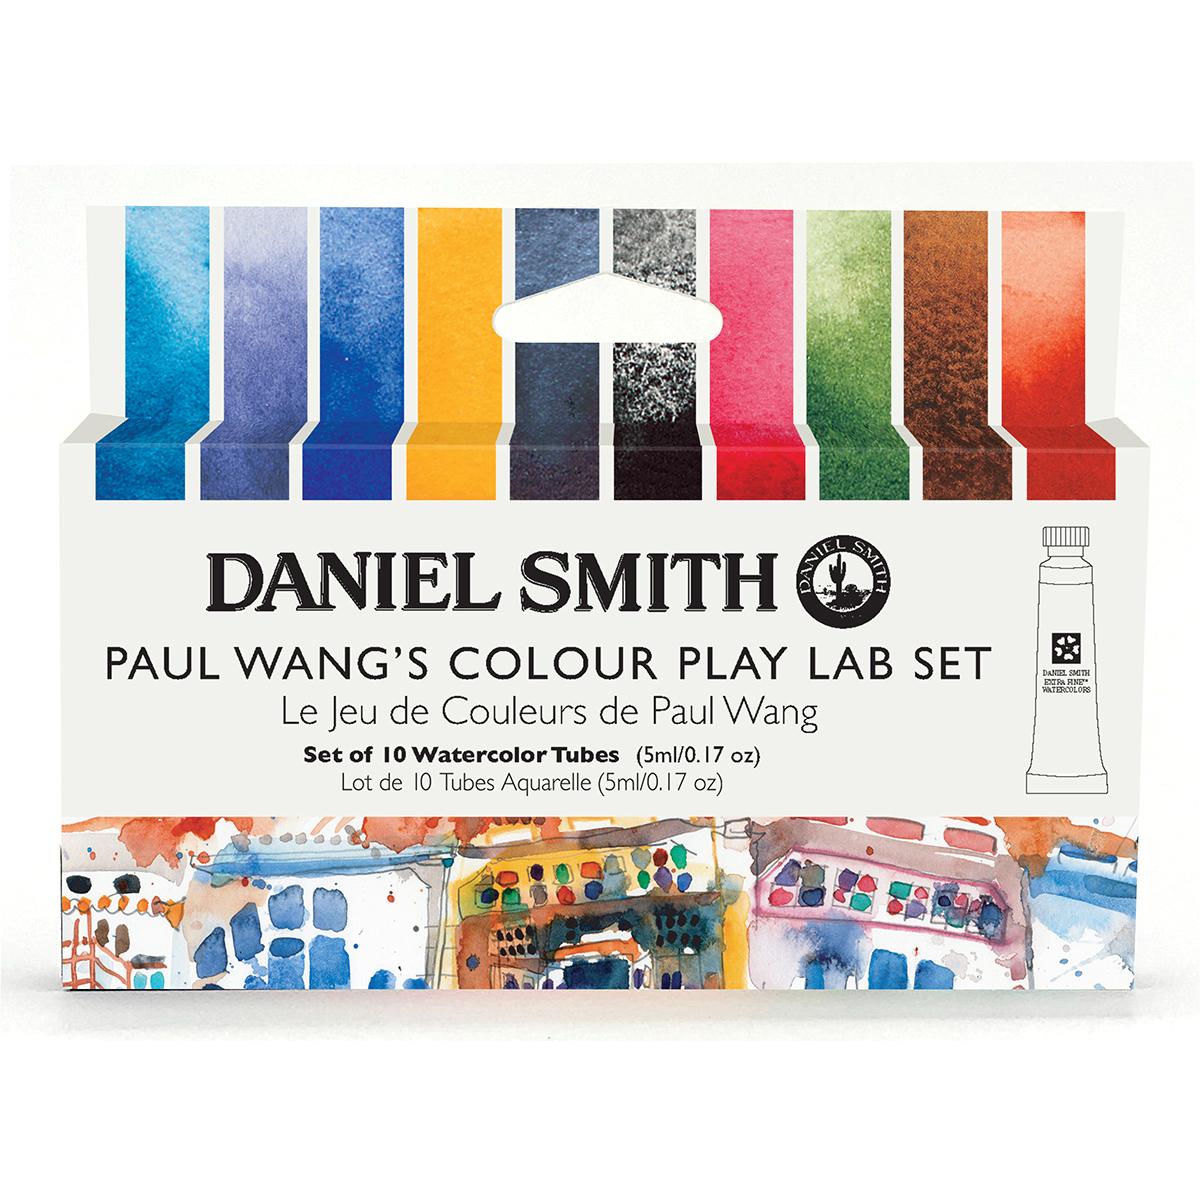 DANIEL SMITH ポール ワンカラープレーラボセット 10色 スミス ダニエル 人気ブランド多数対象 セット 5mlチューブ スピード対応 全国送料無料 水彩絵具